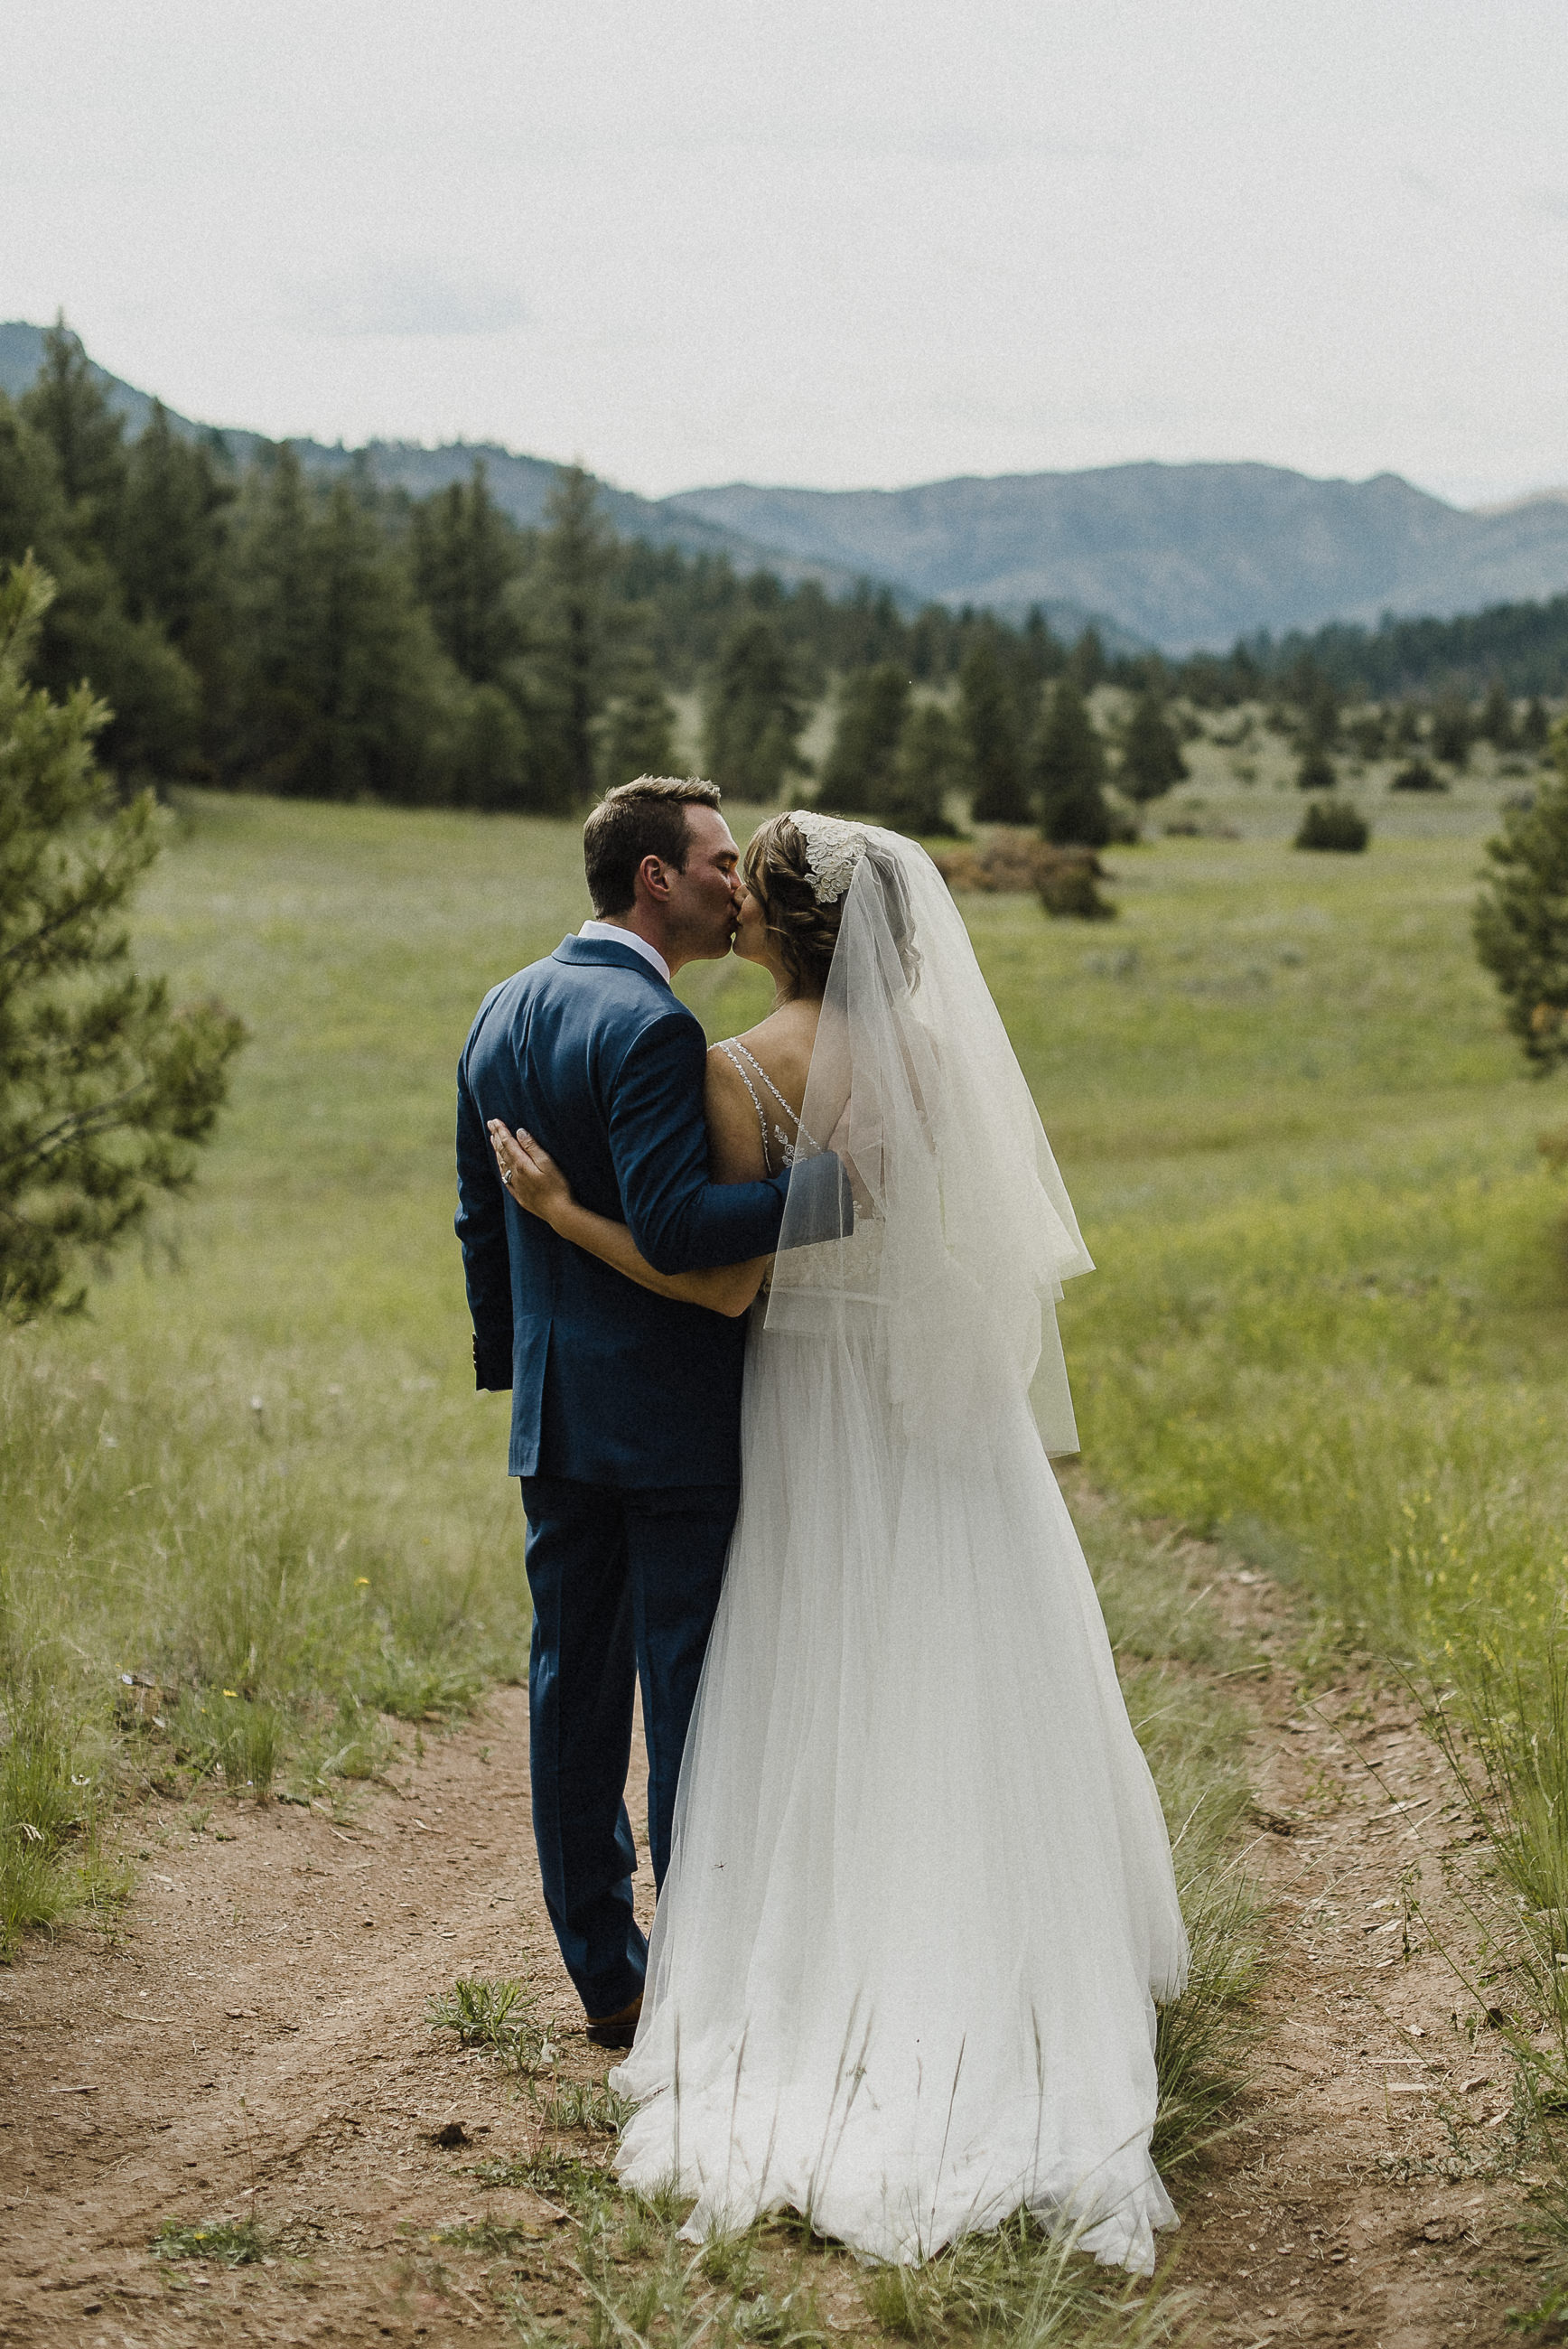 Romantic Wedding Photography in Montana